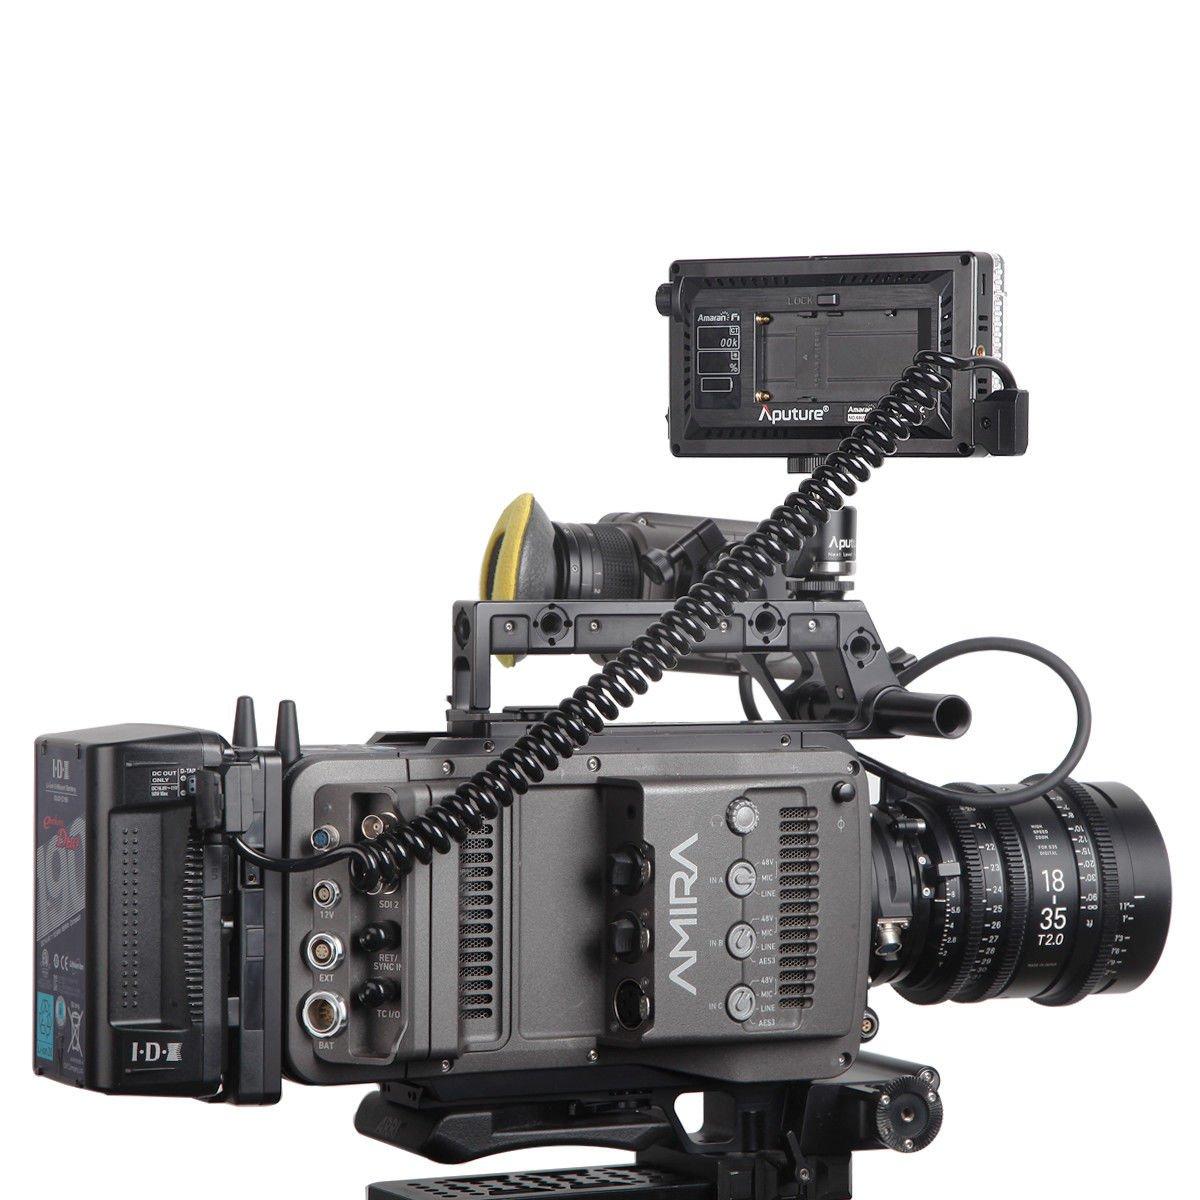 Aputure Amaran AL-F7 3200-9500K CRI/TLCI 95 LED panel LED video camera light (Aputure H198 Upgrade Version) with DigiKit cleaning cloth by Aputure (Image #8)